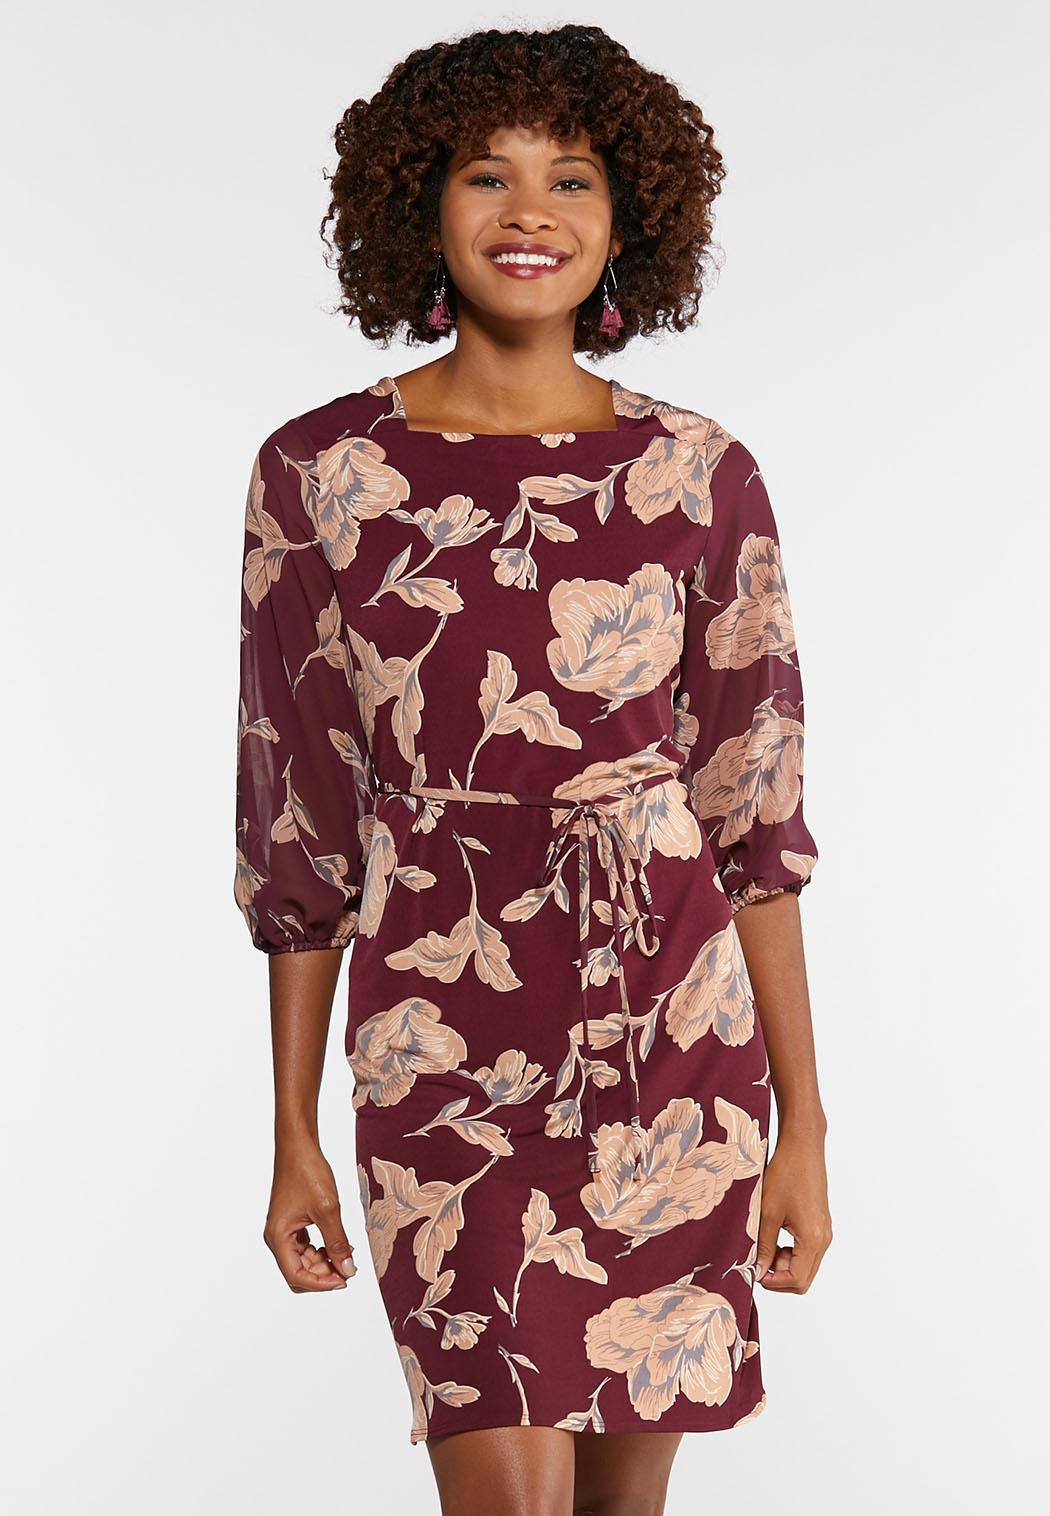 Square Neck Floral Dress Junior/Misses Cato Fashions